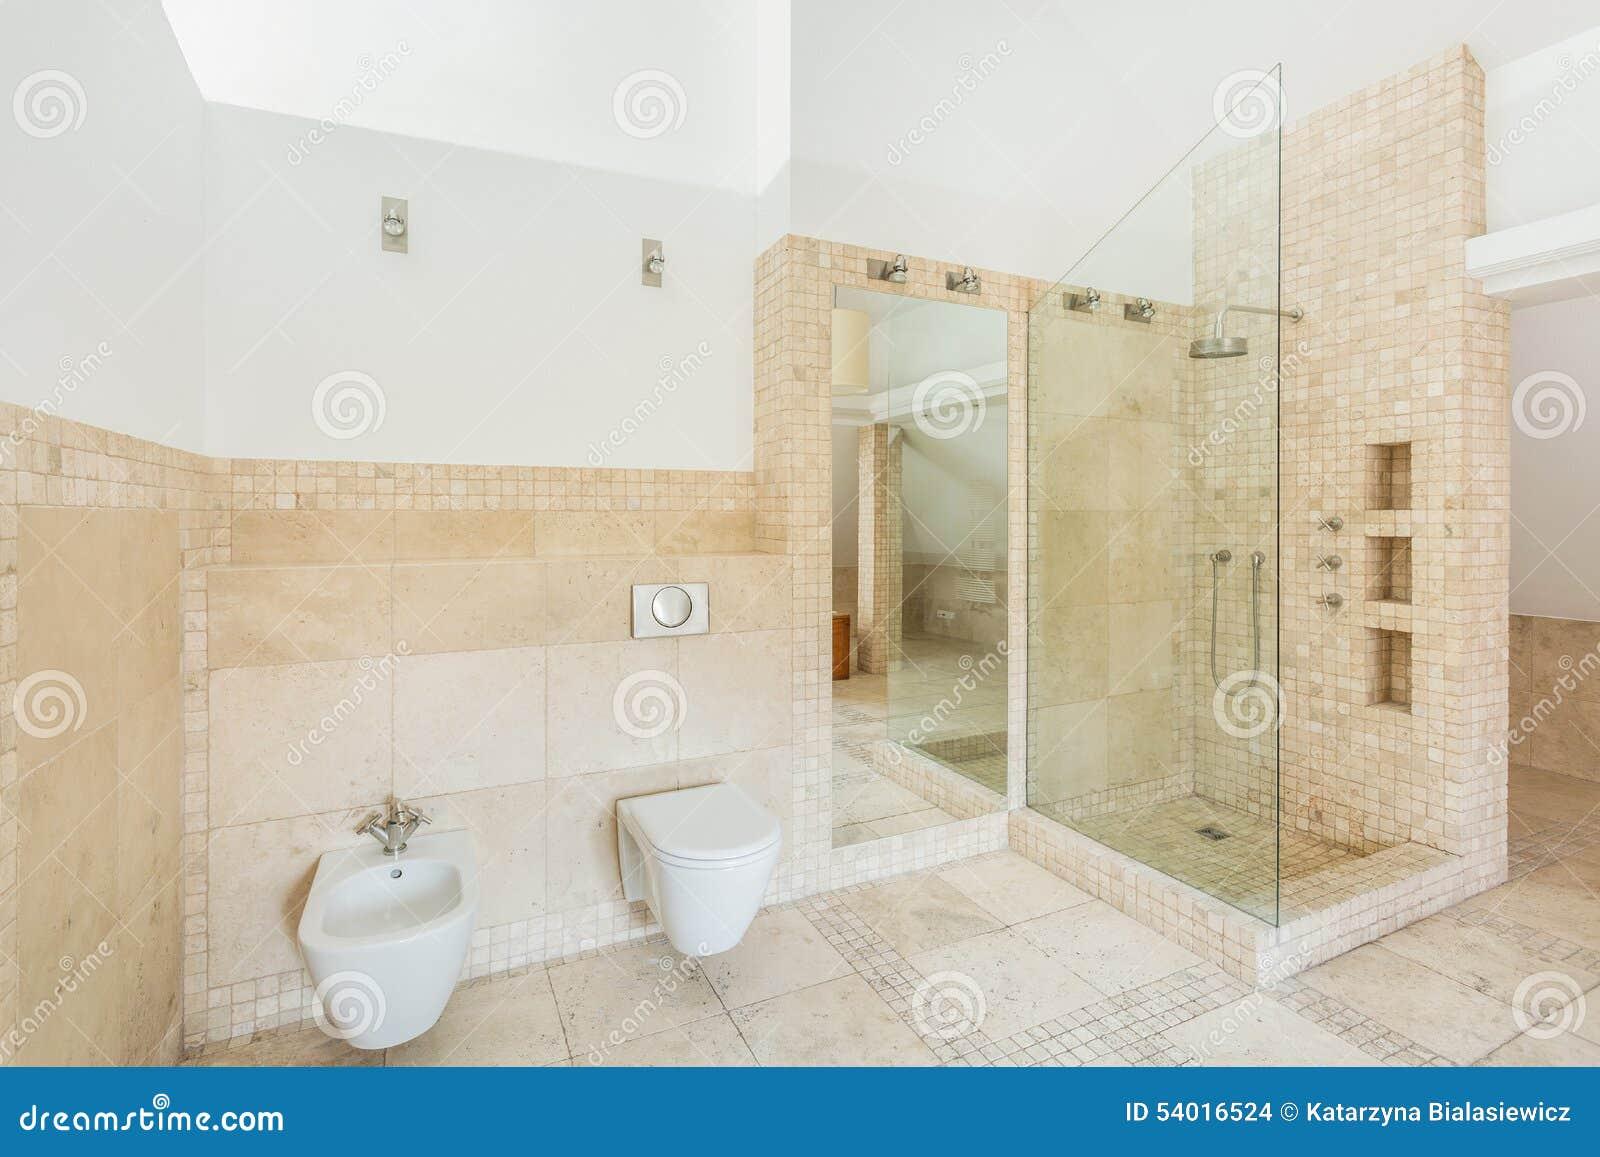 Rock Tiles Bathroom Stock Photo Image Of Exclusive Bathroom 54016524